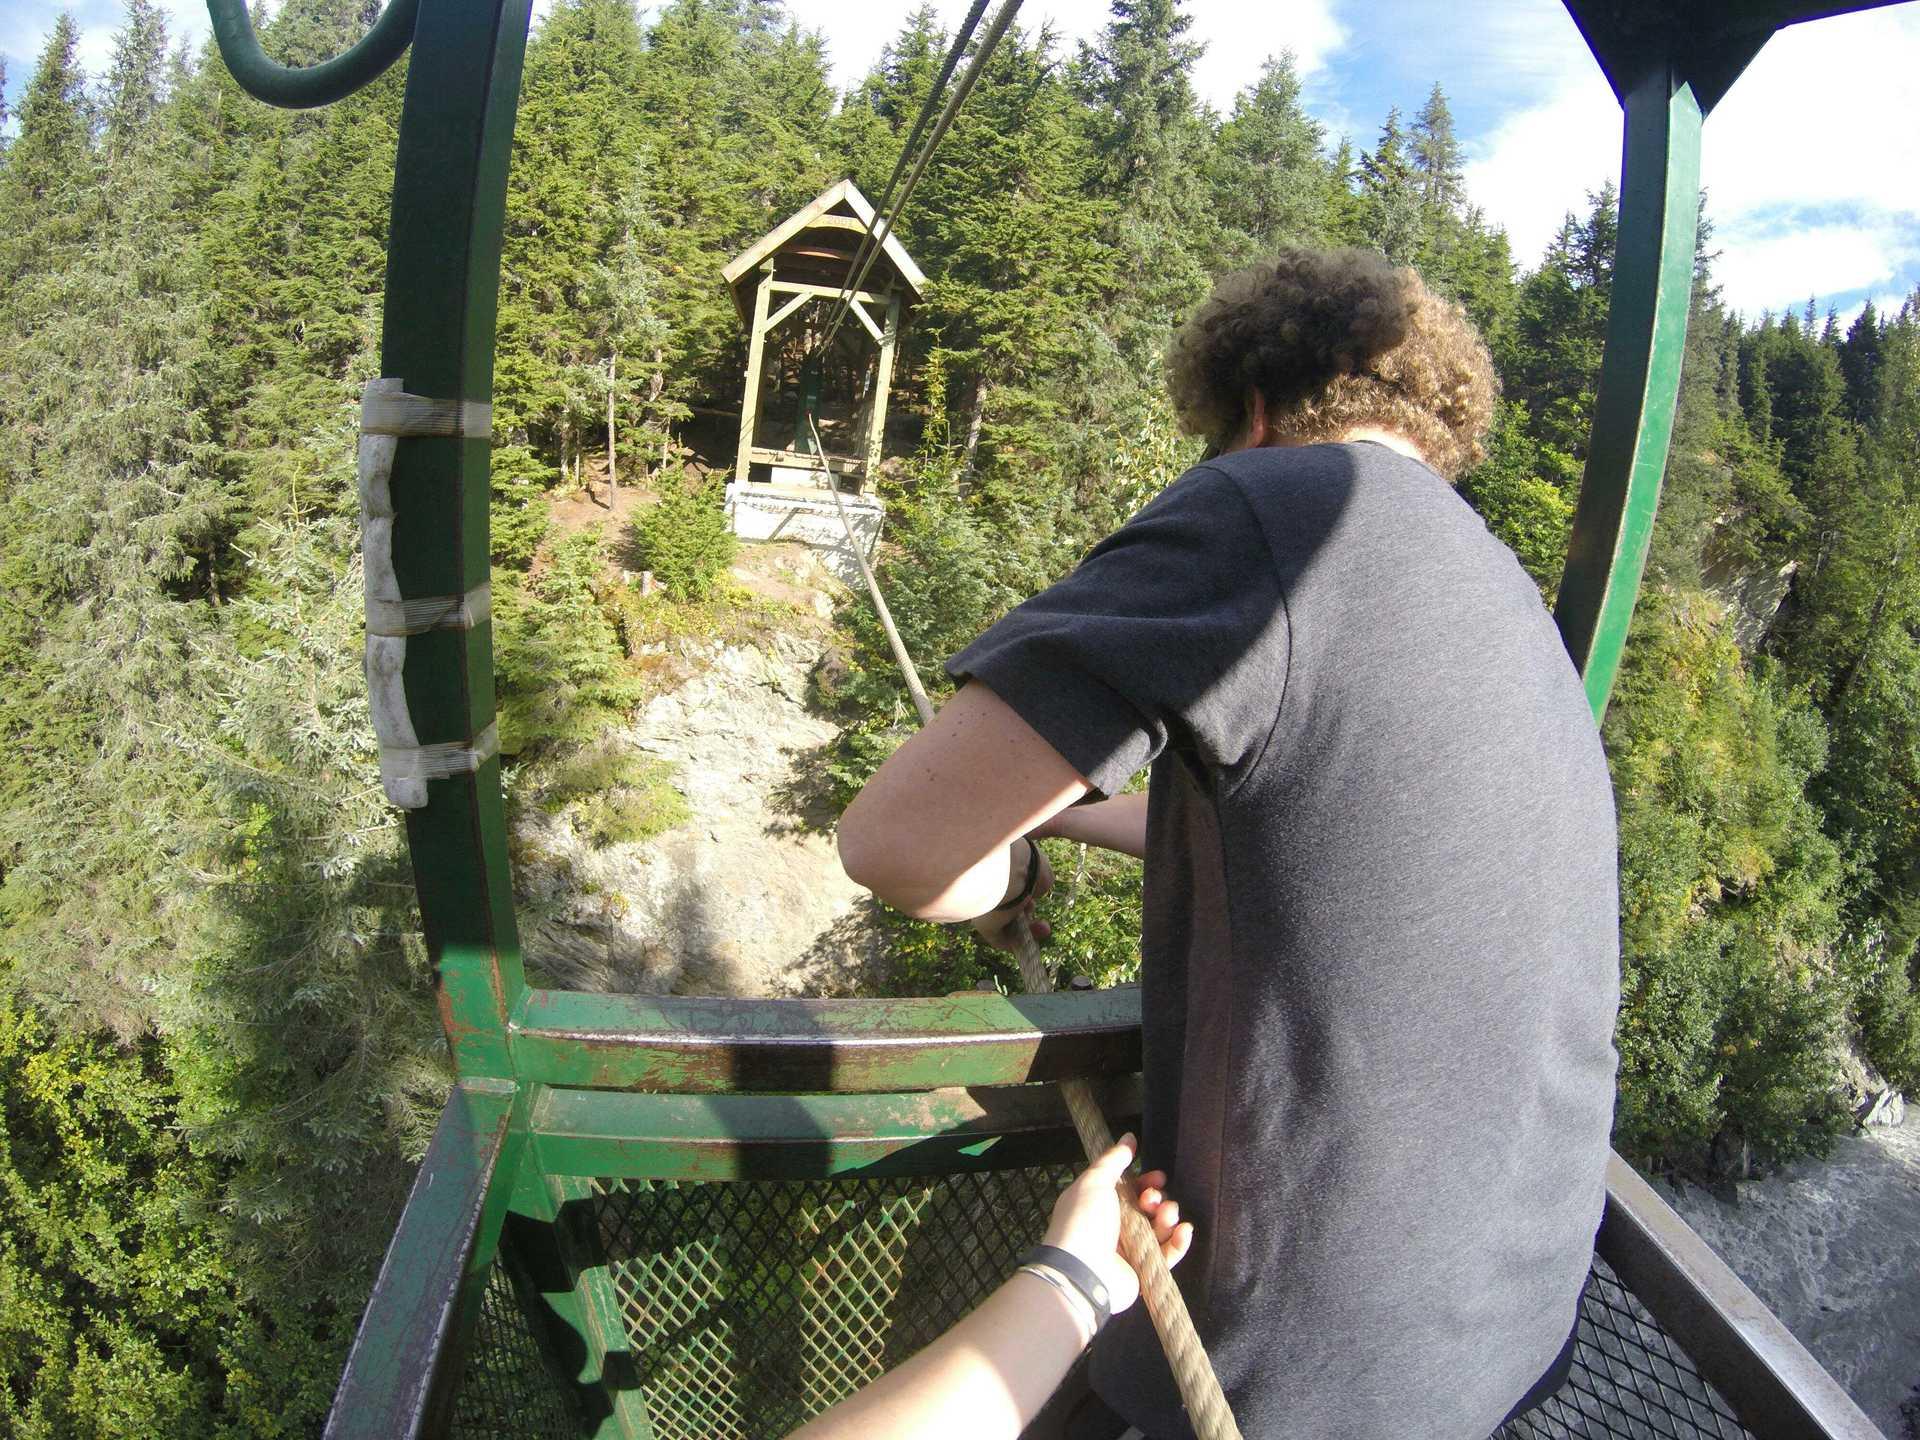 Girdwood, Alaska   elise81, adult, outdoors, travel